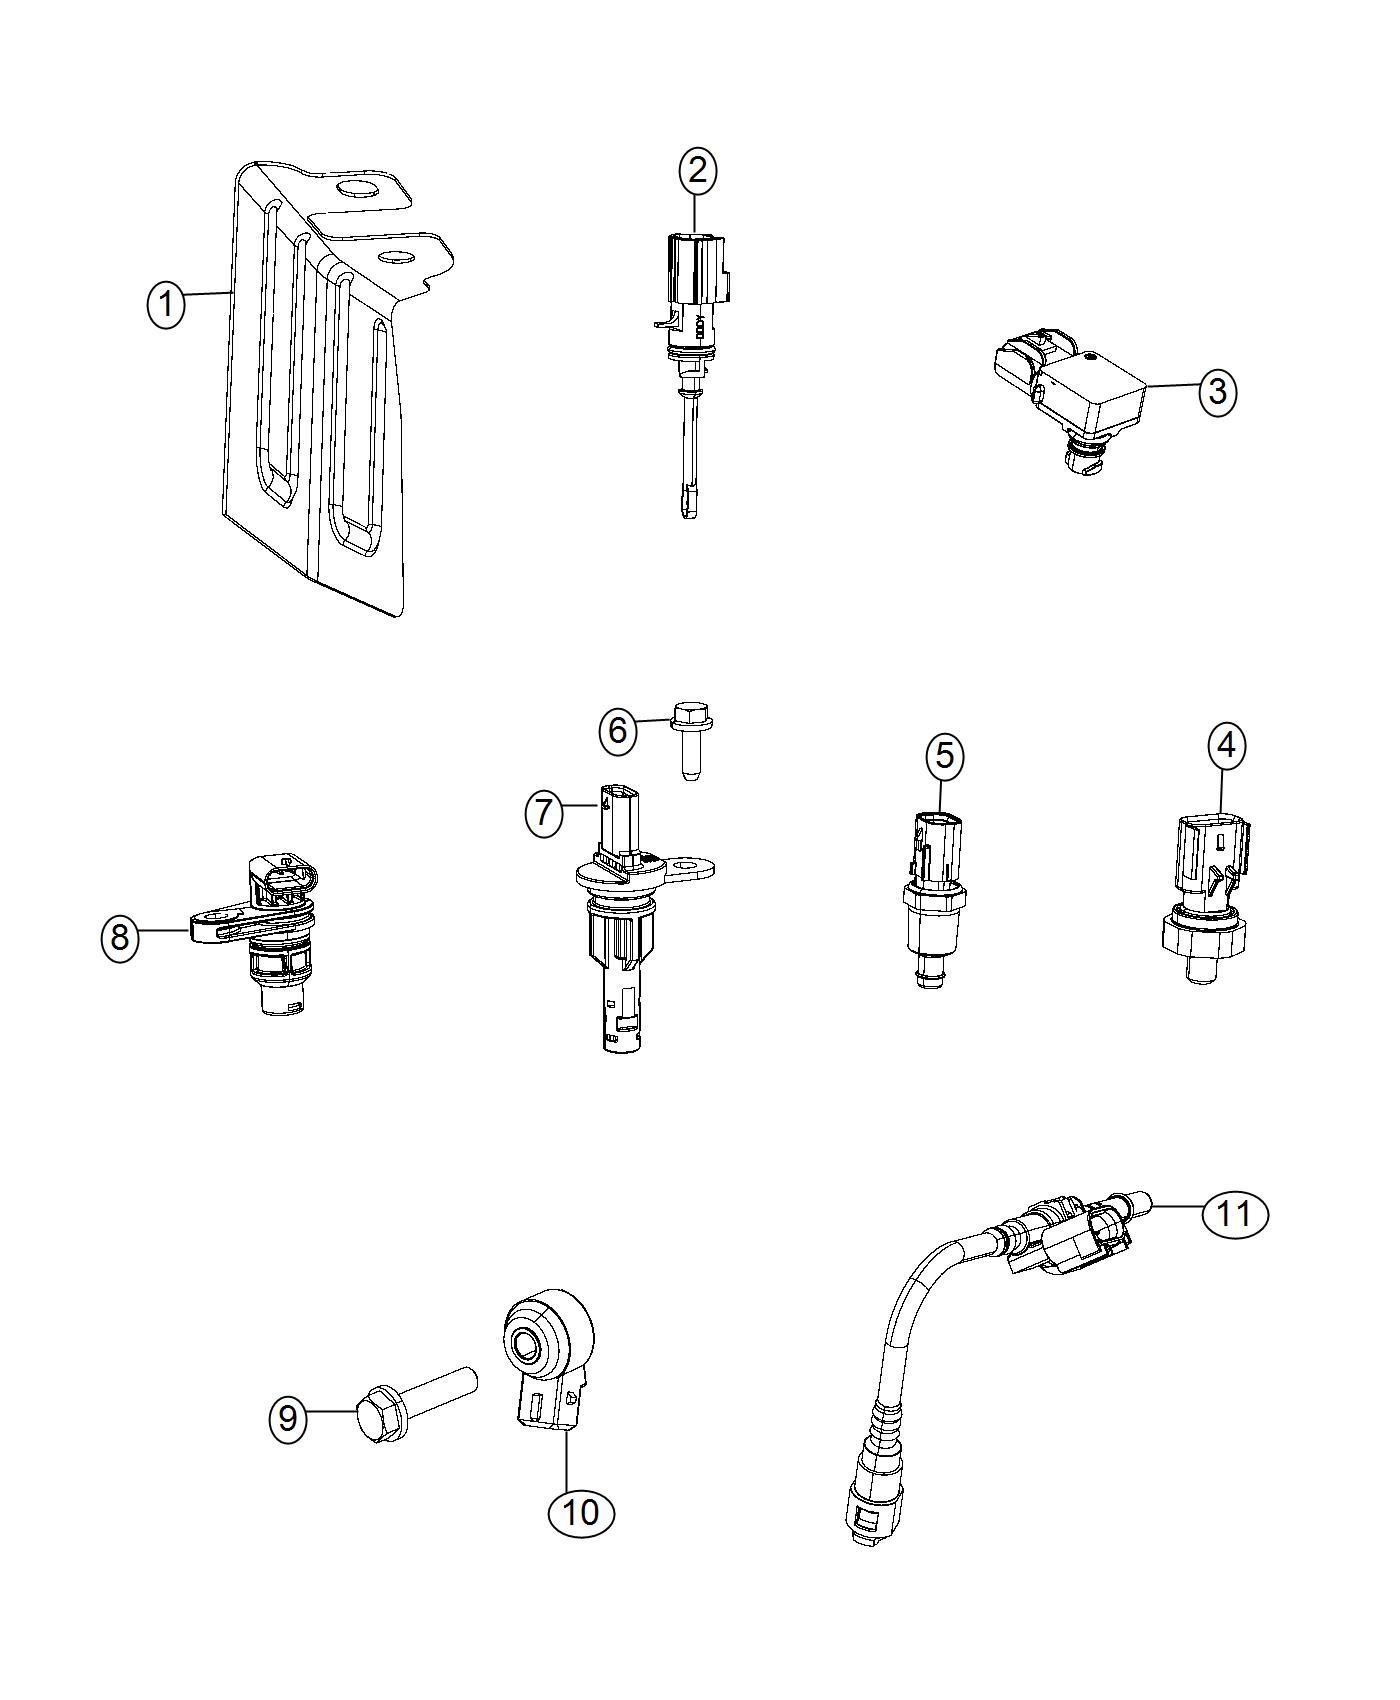 Ram Used For Sensor And Tube Pressure Fuel Dfk